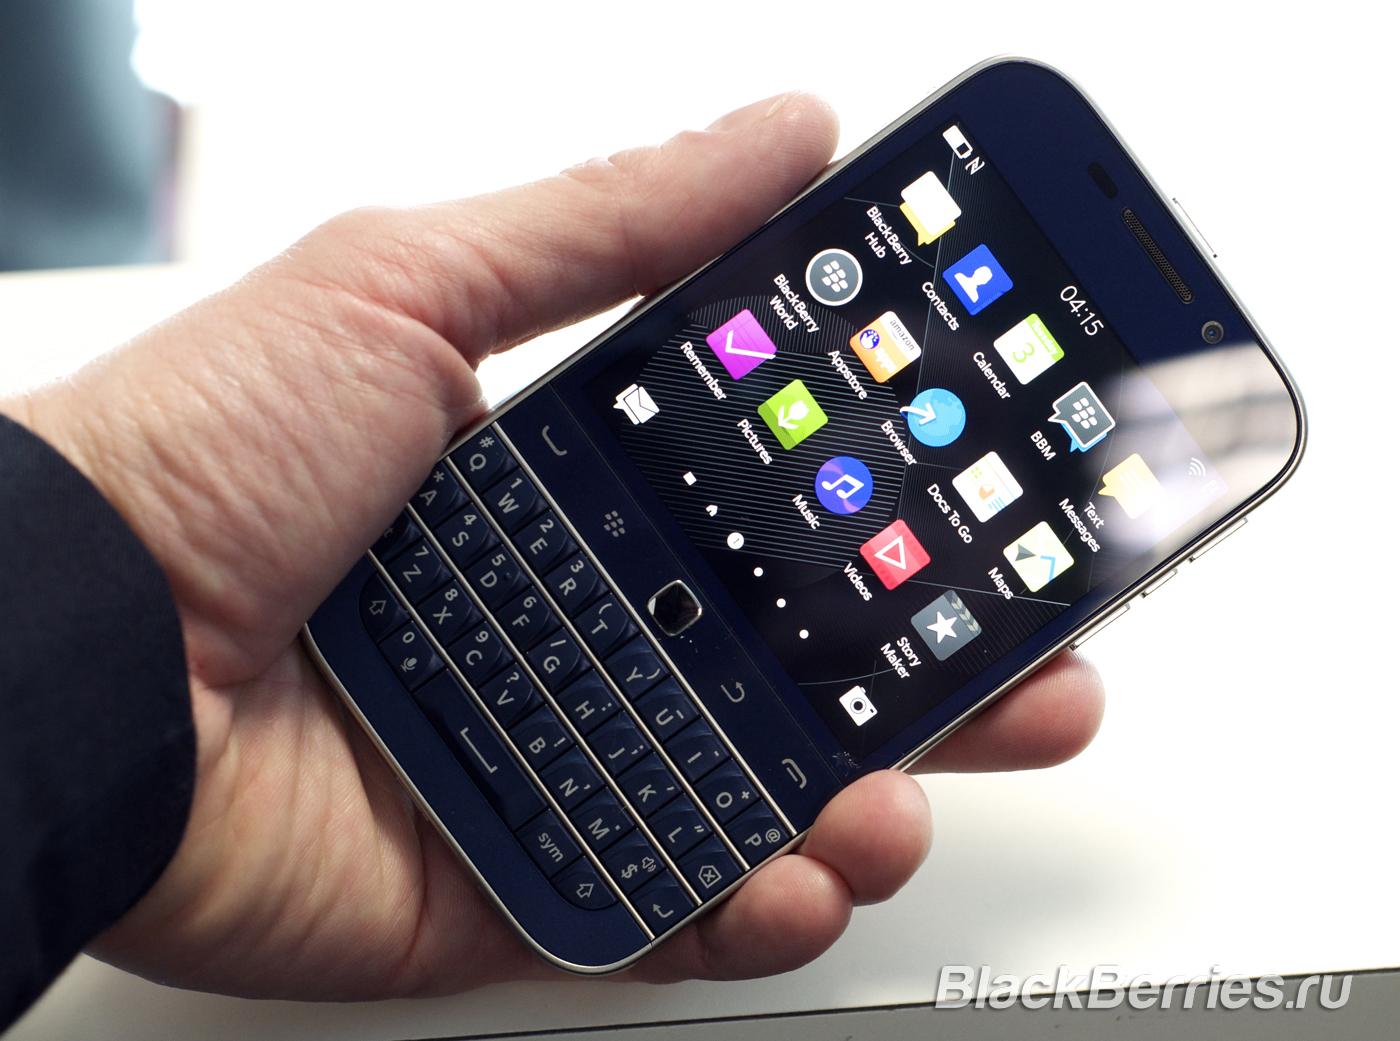 BlackBerry-Classic-White-Blue-Bronze-05